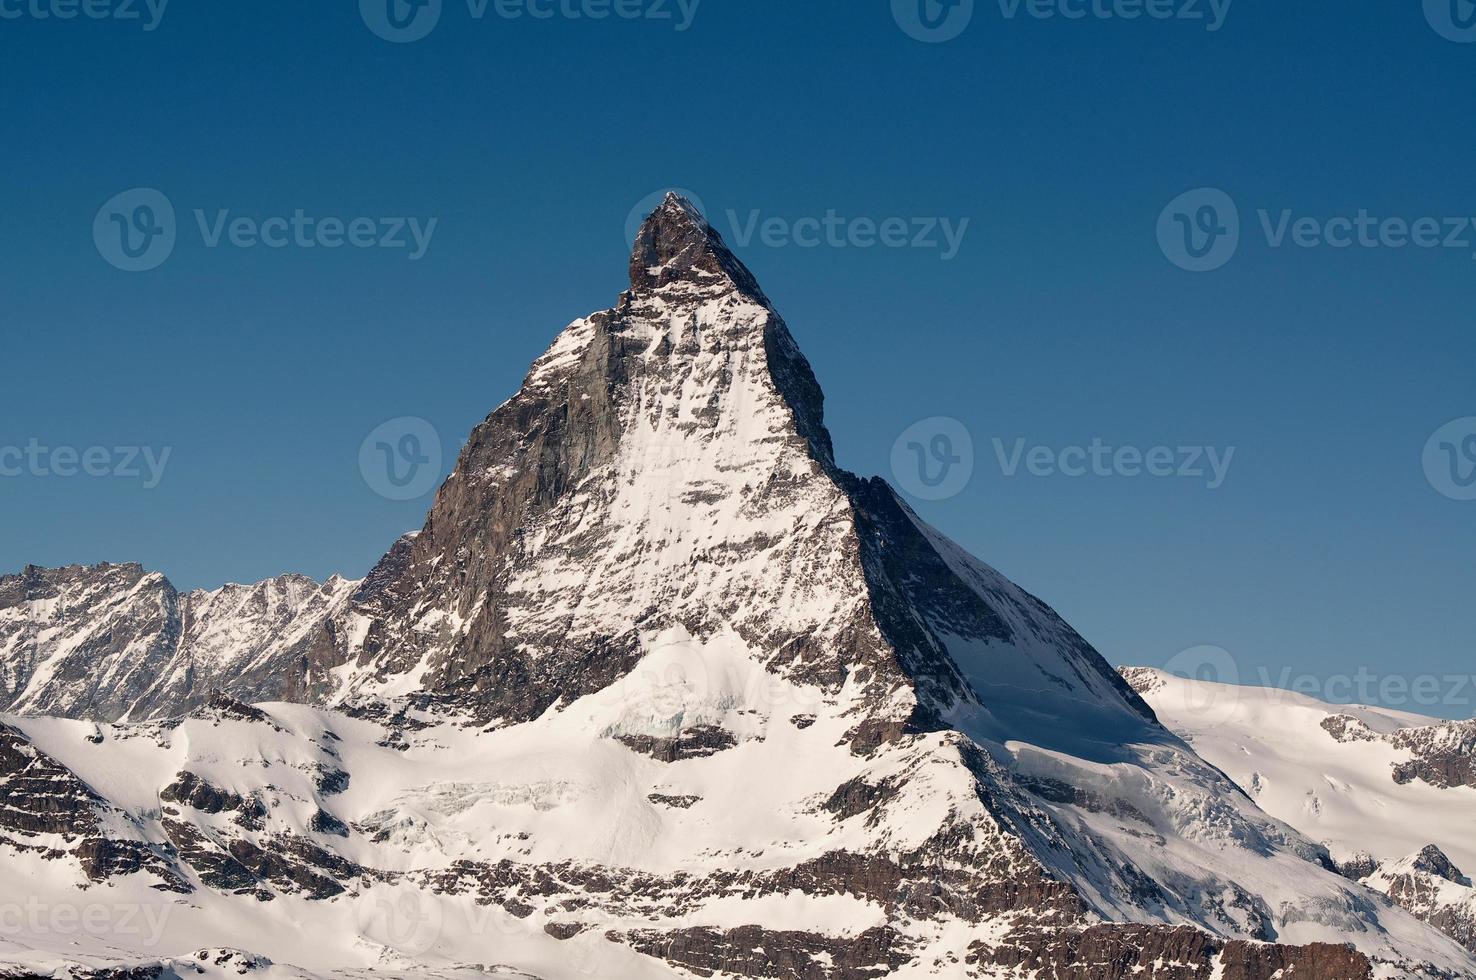 The Matterhorn in Switzerland photo